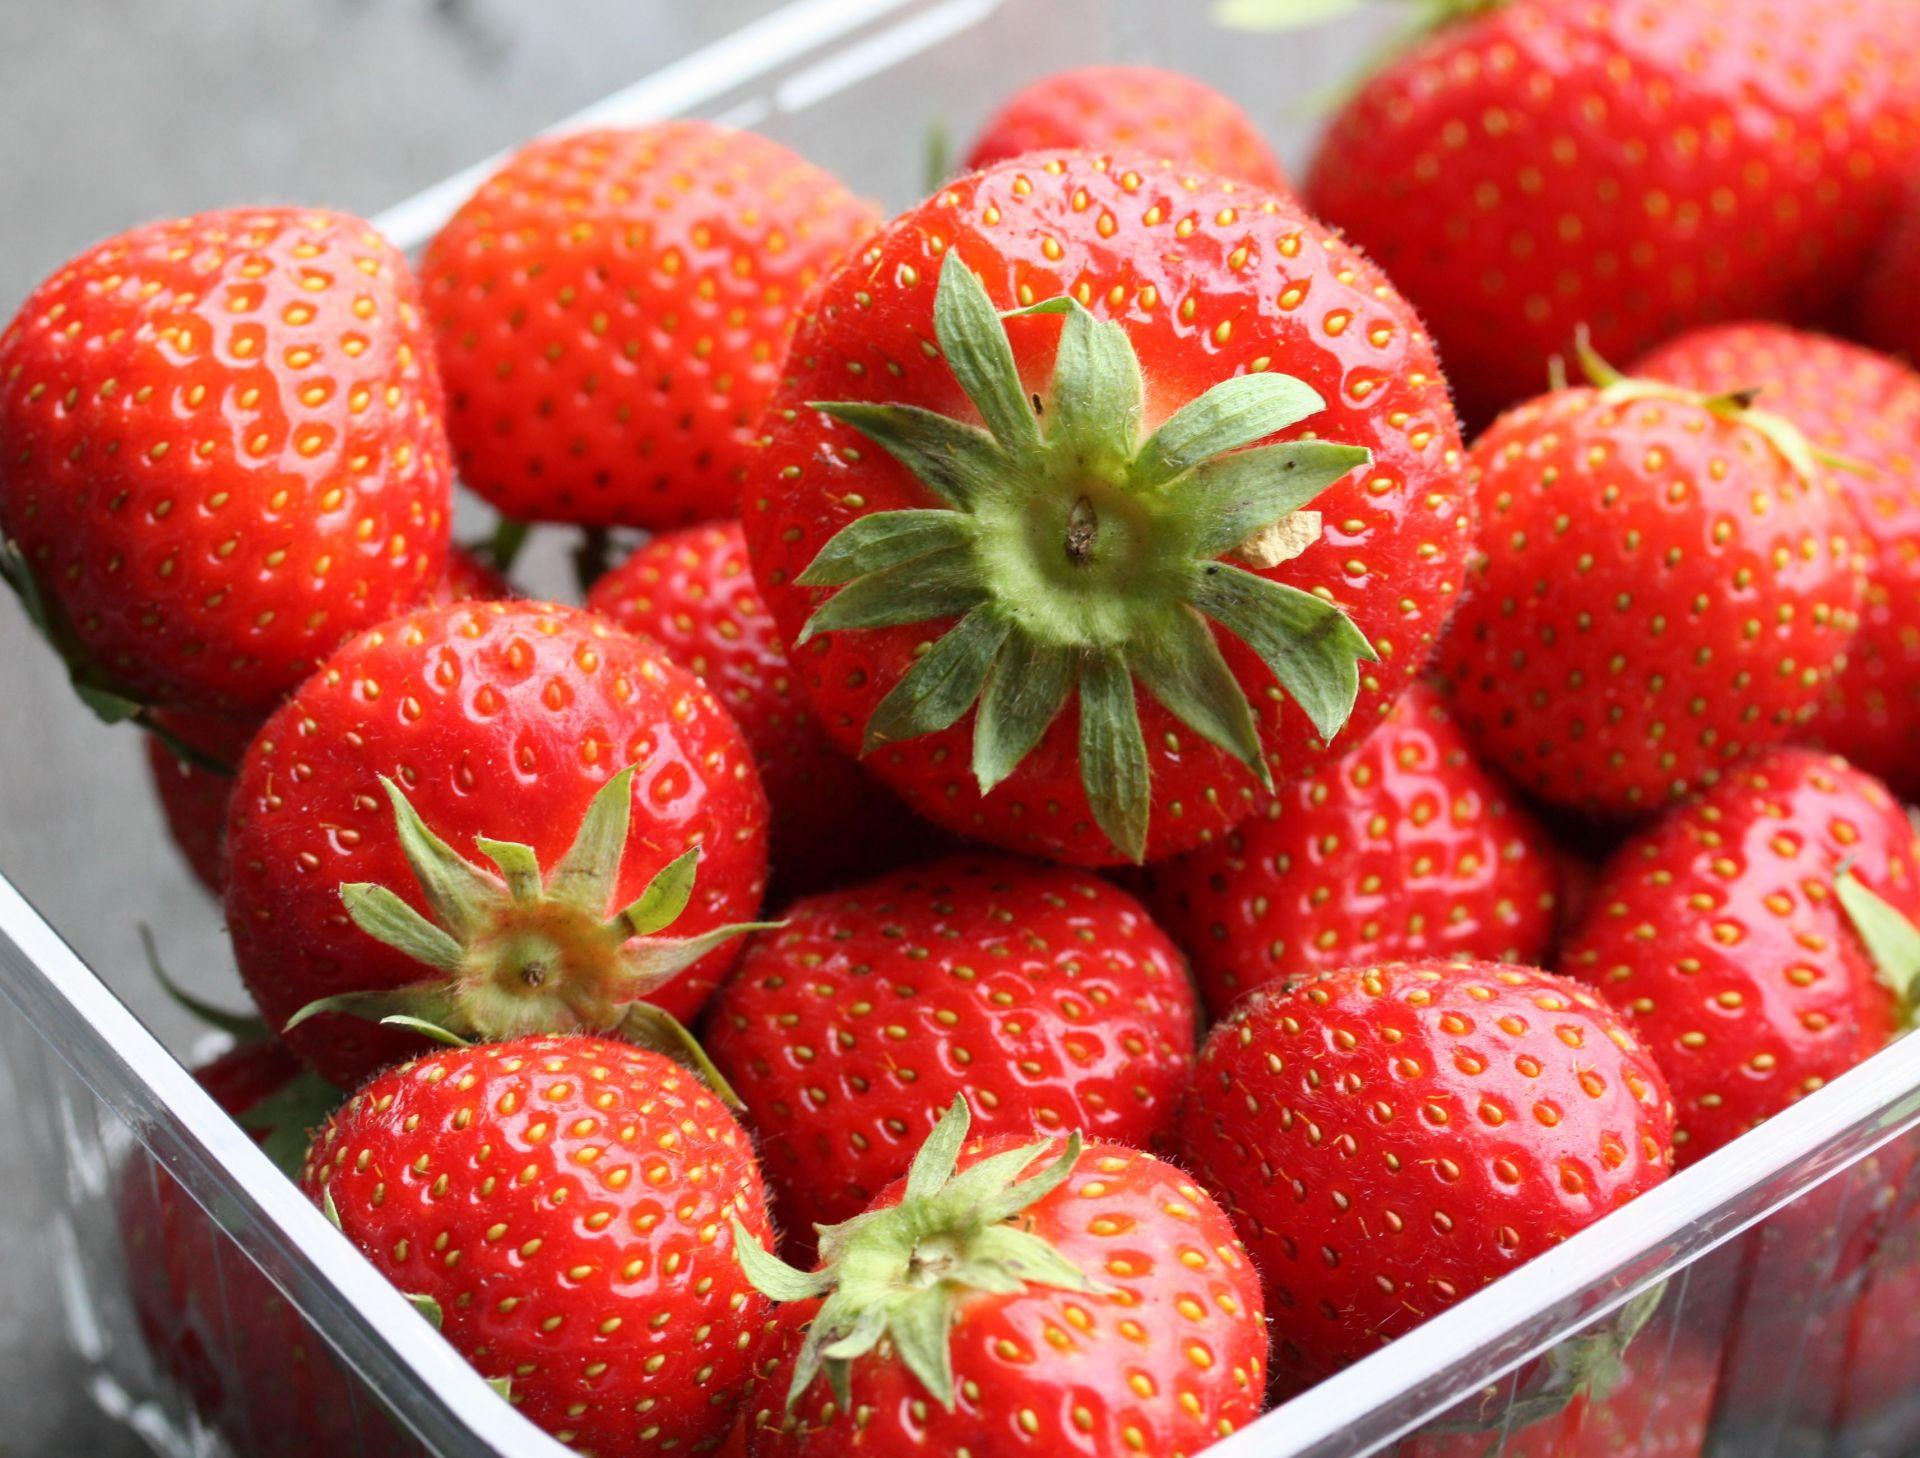 Sonata aardbeien